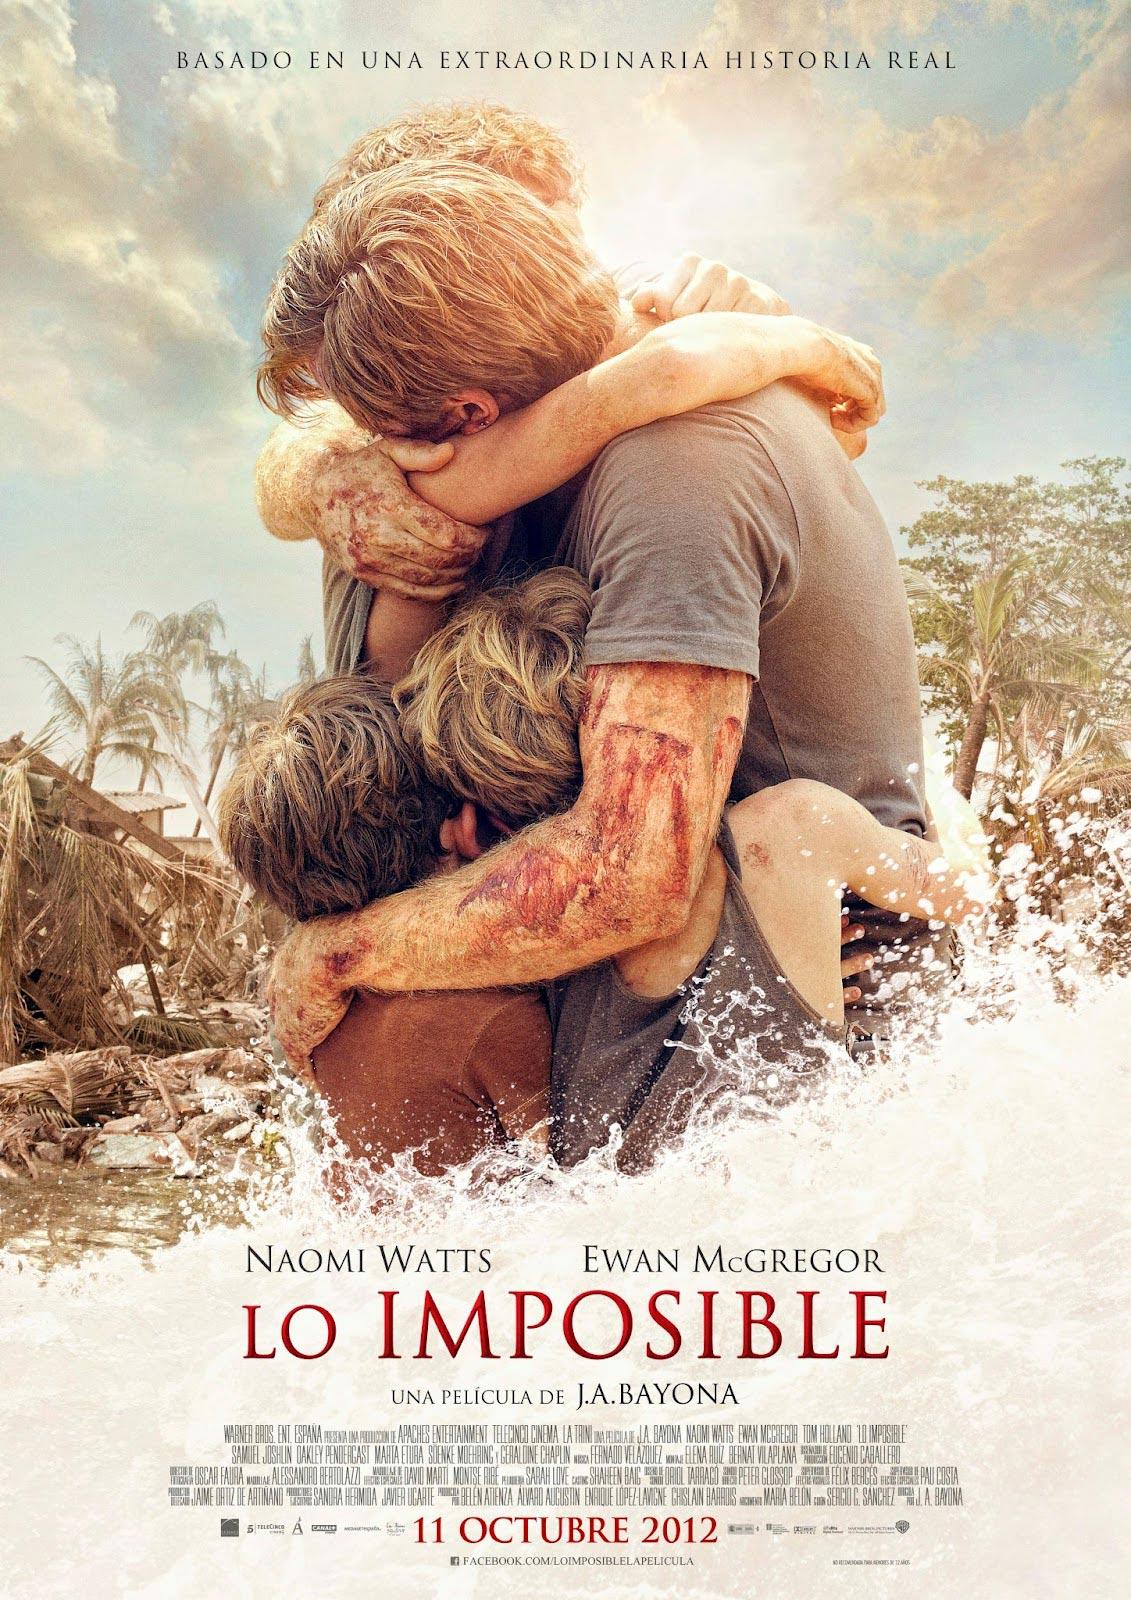 http://4.bp.blogspot.com/-QgmaS7YweH0/UNCmd4r-g7I/AAAAAAAABDI/trZgvQ3kymI/s1600/The+Impossible+Poster1.jpg